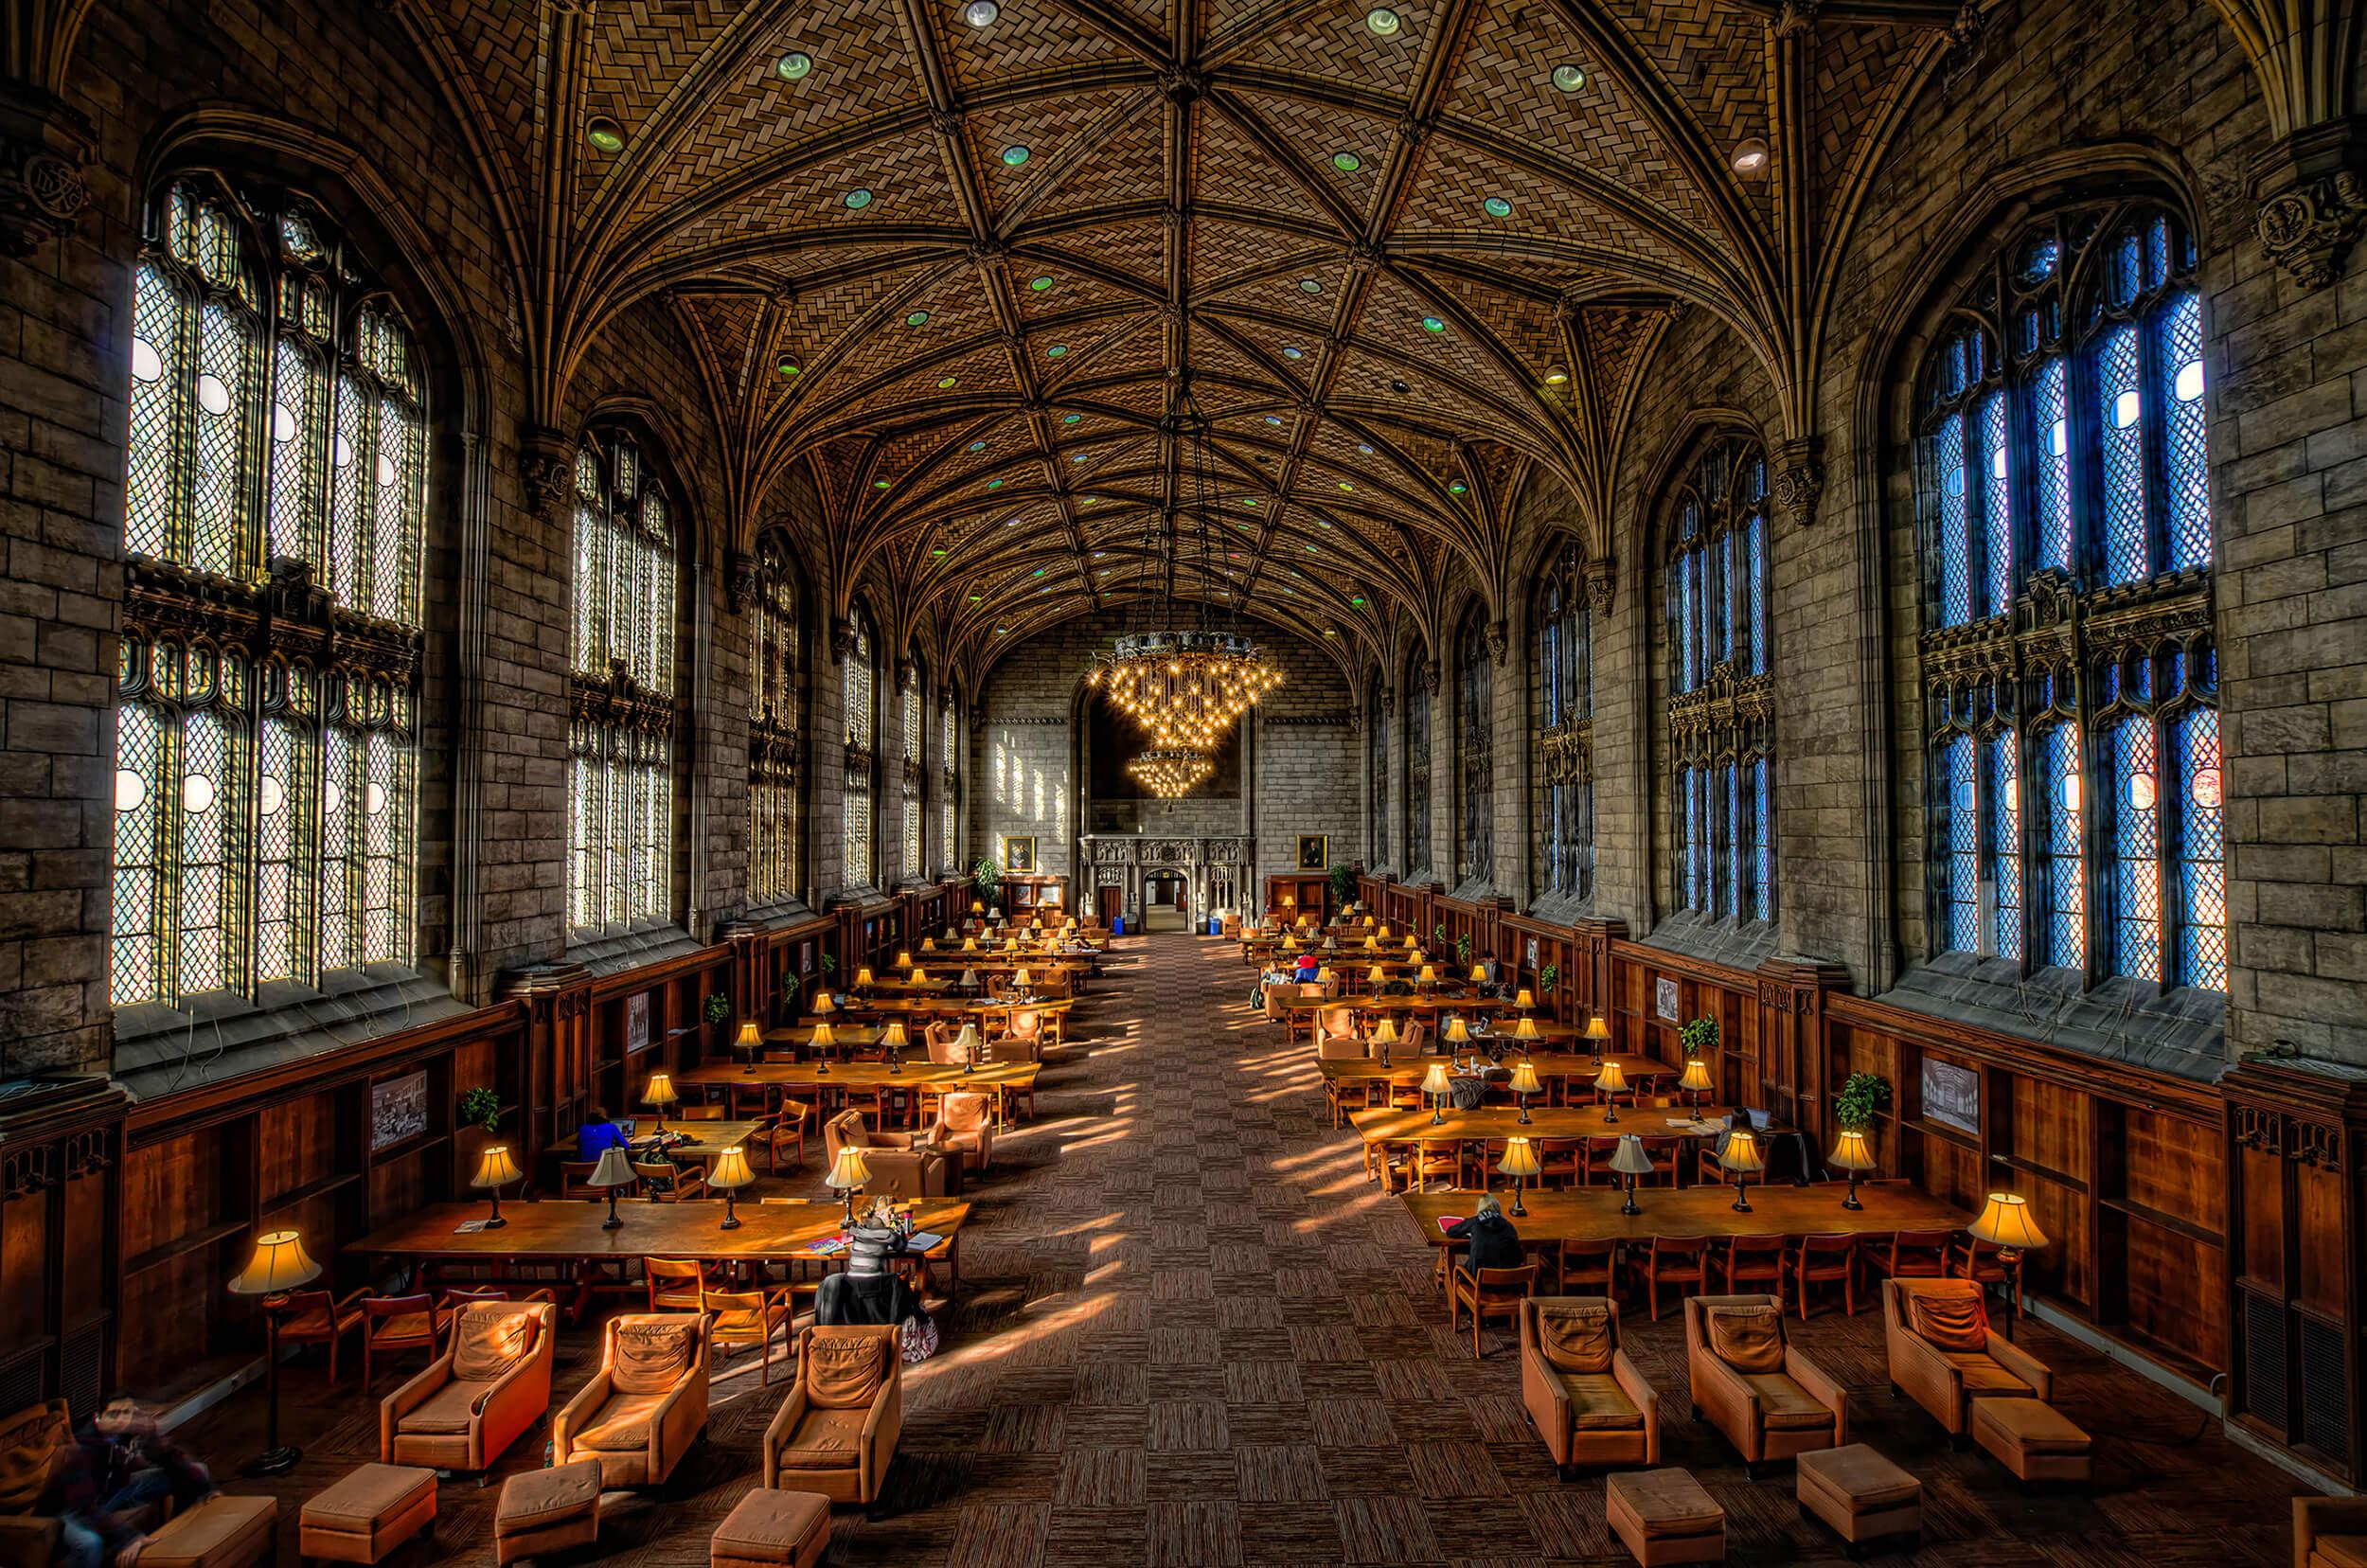 University of Chicago Harper Library